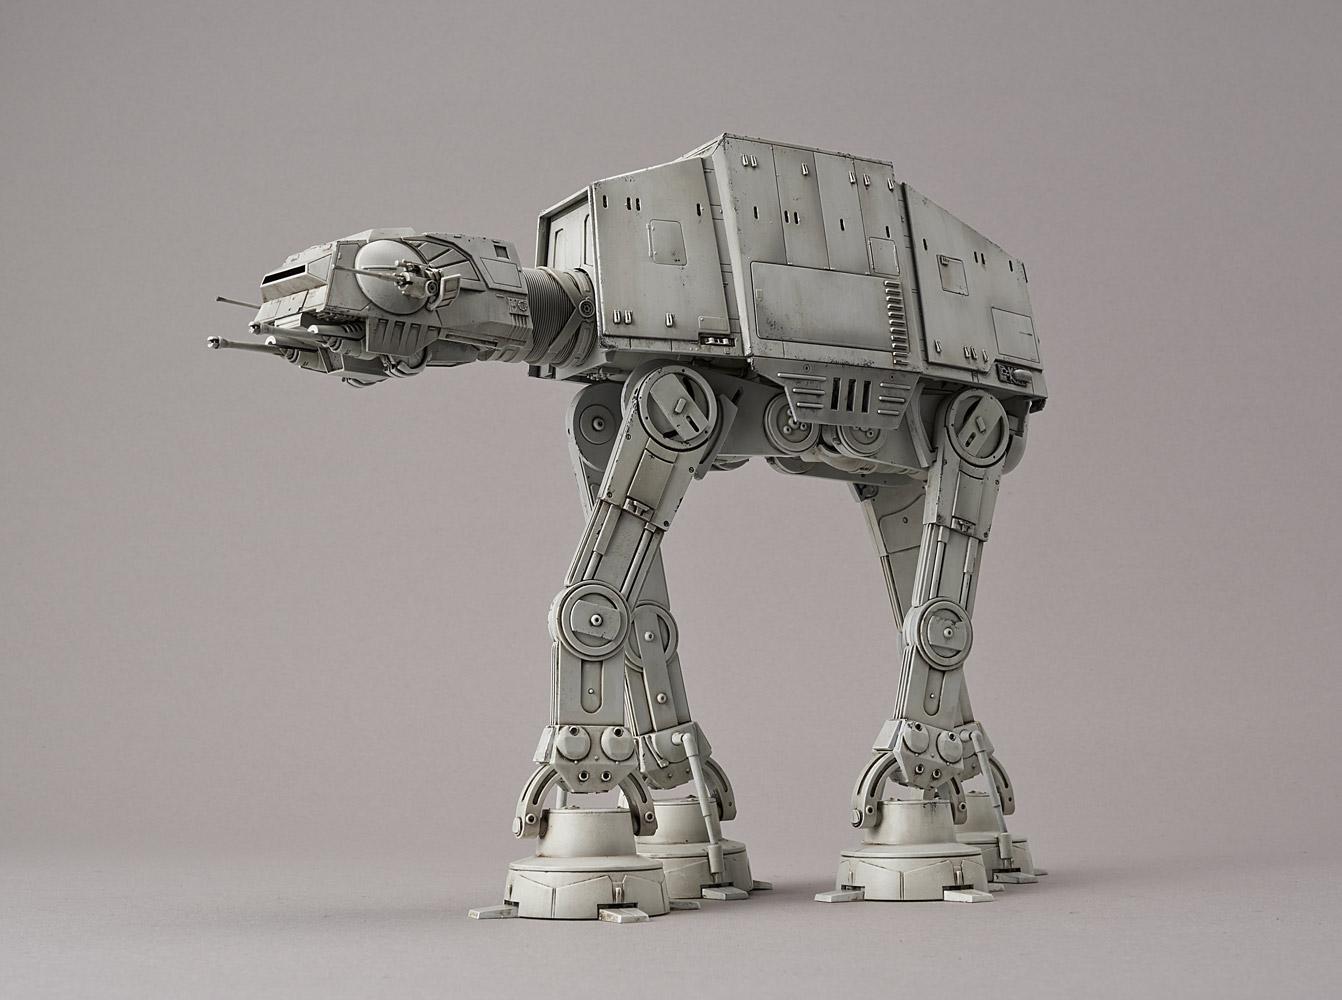 Star Wars: AT-AT - 1:144 Scale Model Kit